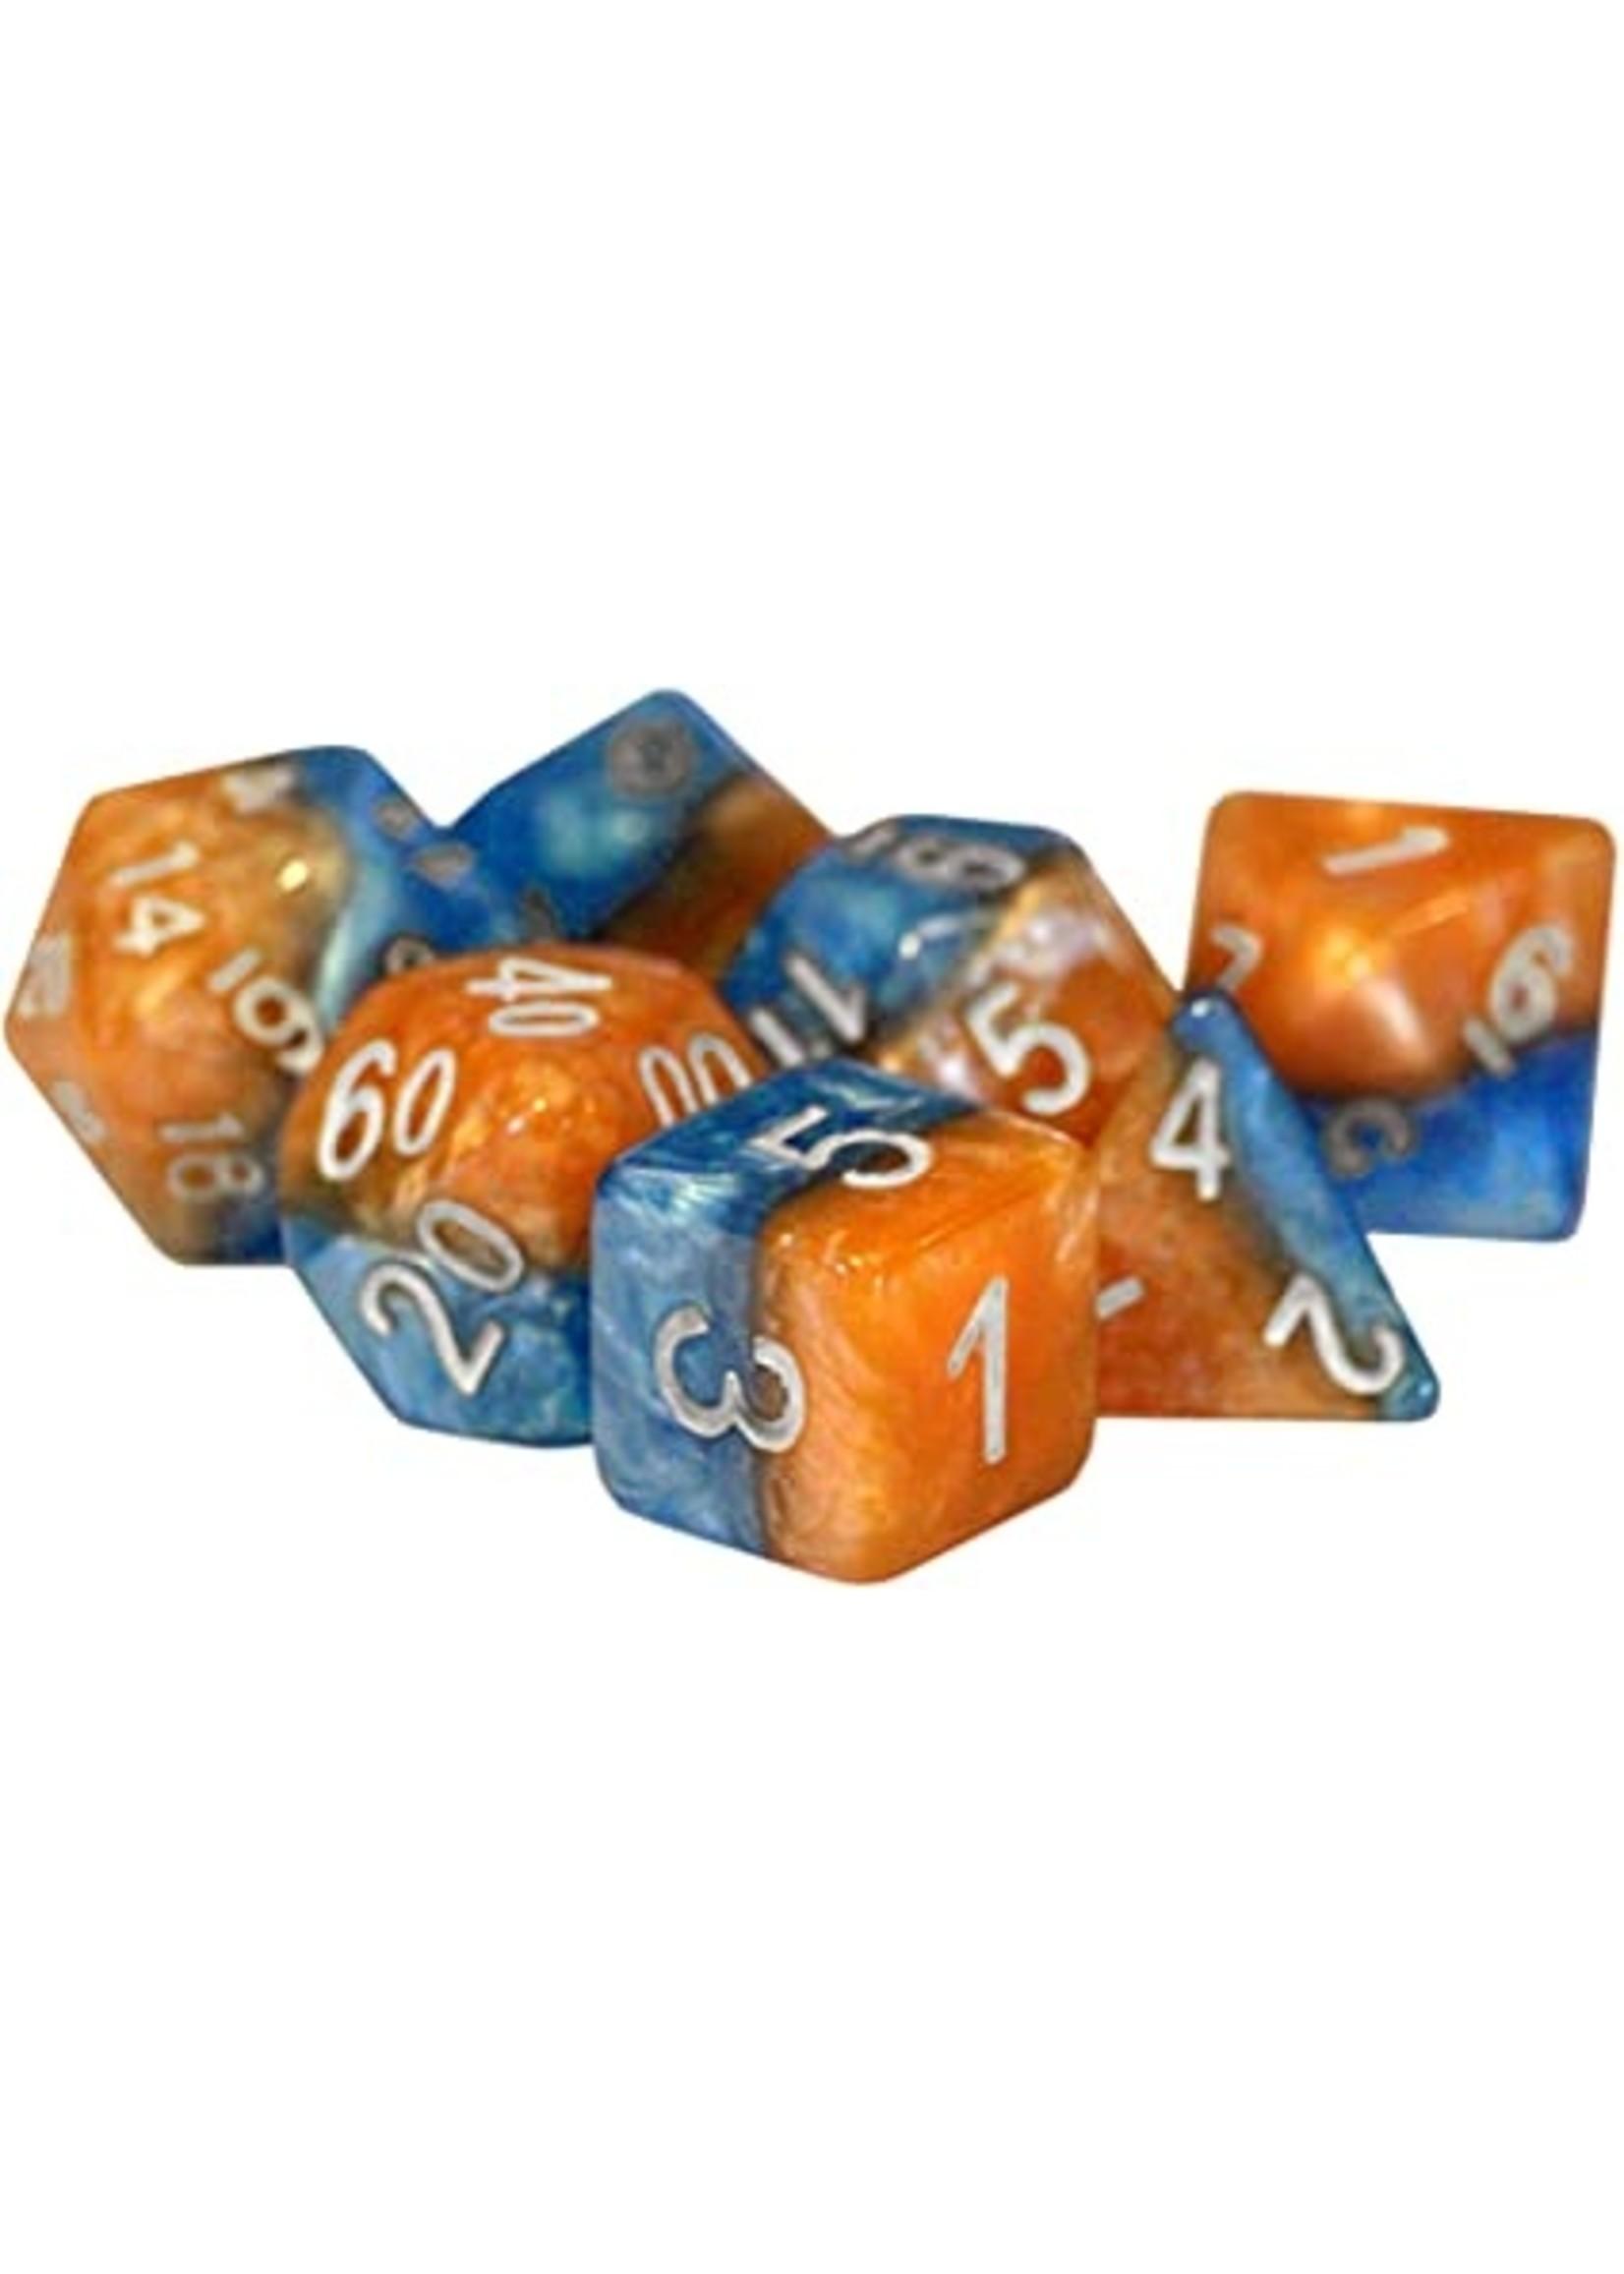 Halfsies Dice - Fire & Dice (7 Polyhedral Dice Set)